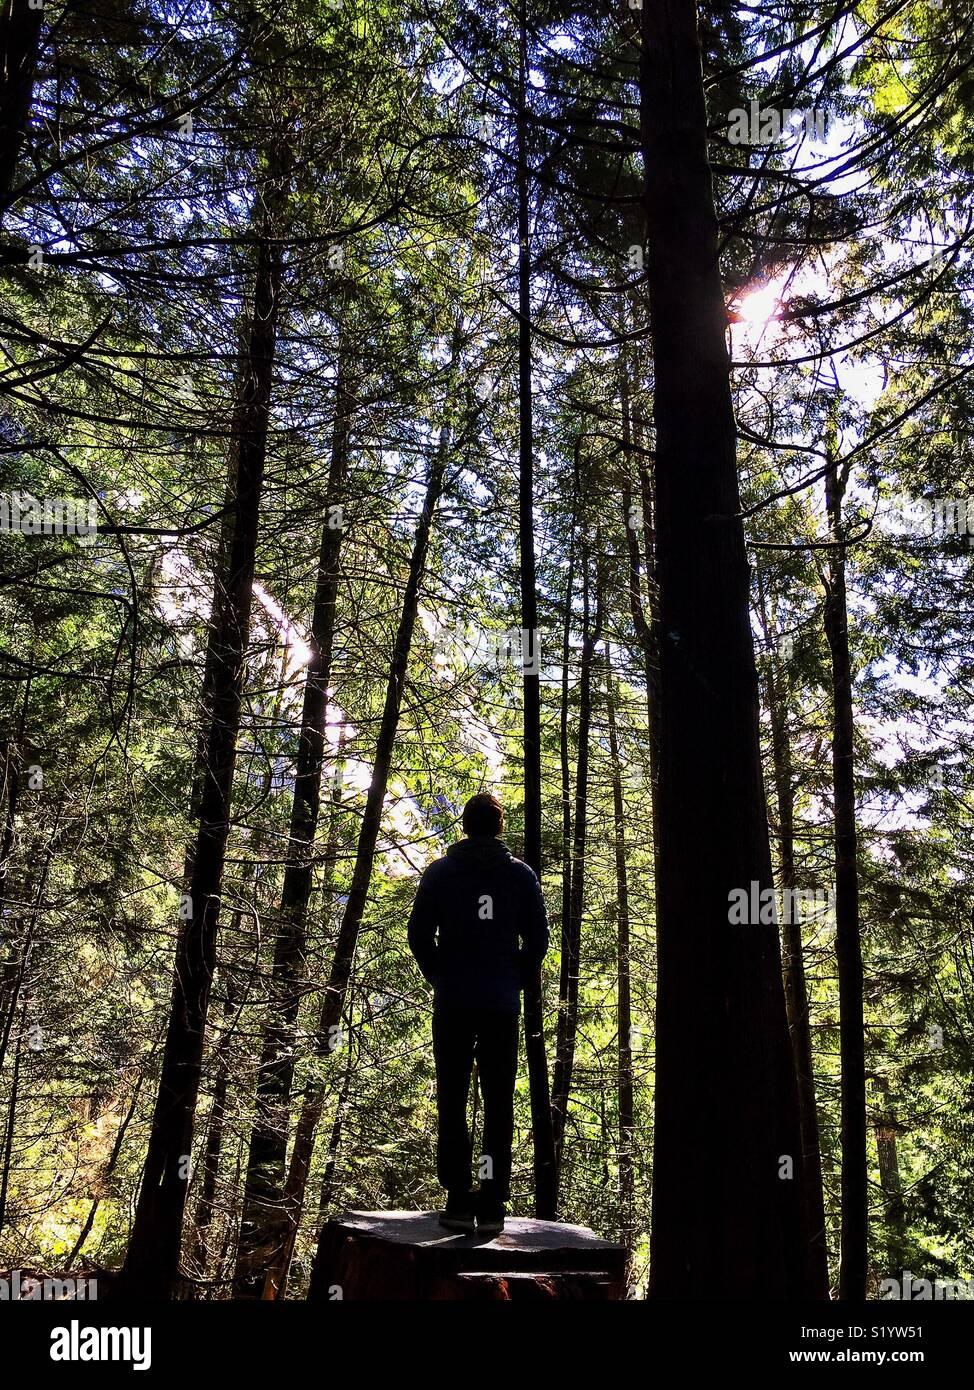 People is nature | America Sobre Ruedas - Stock Image